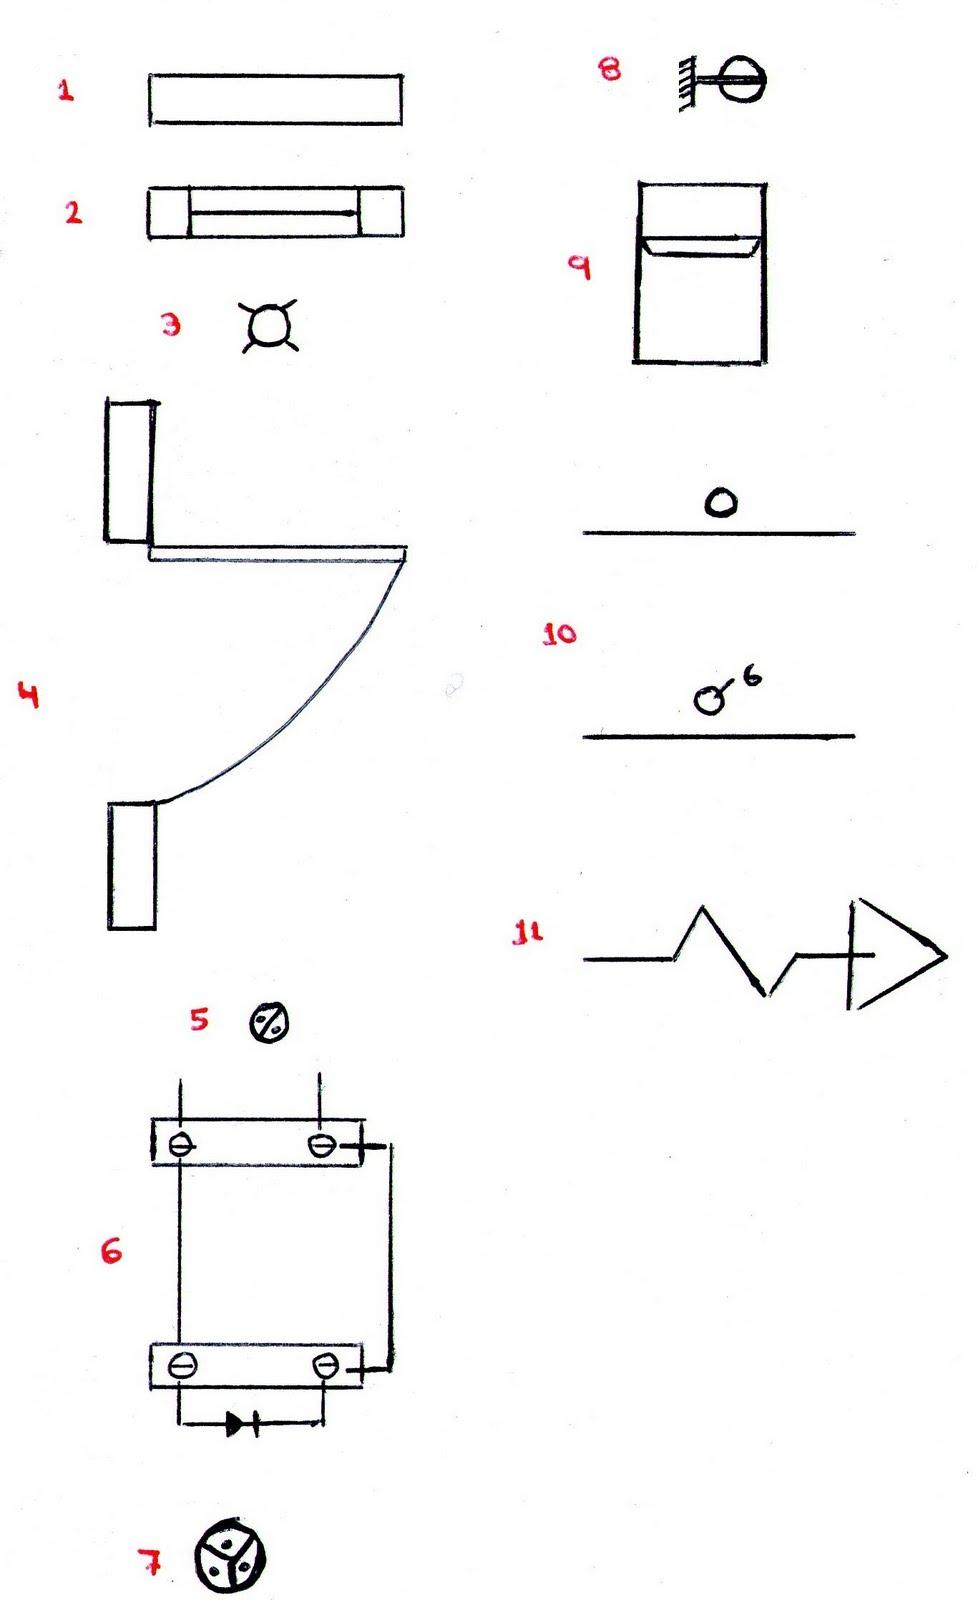 Salomon dibujos for Simbologia de planos arquitectonicos